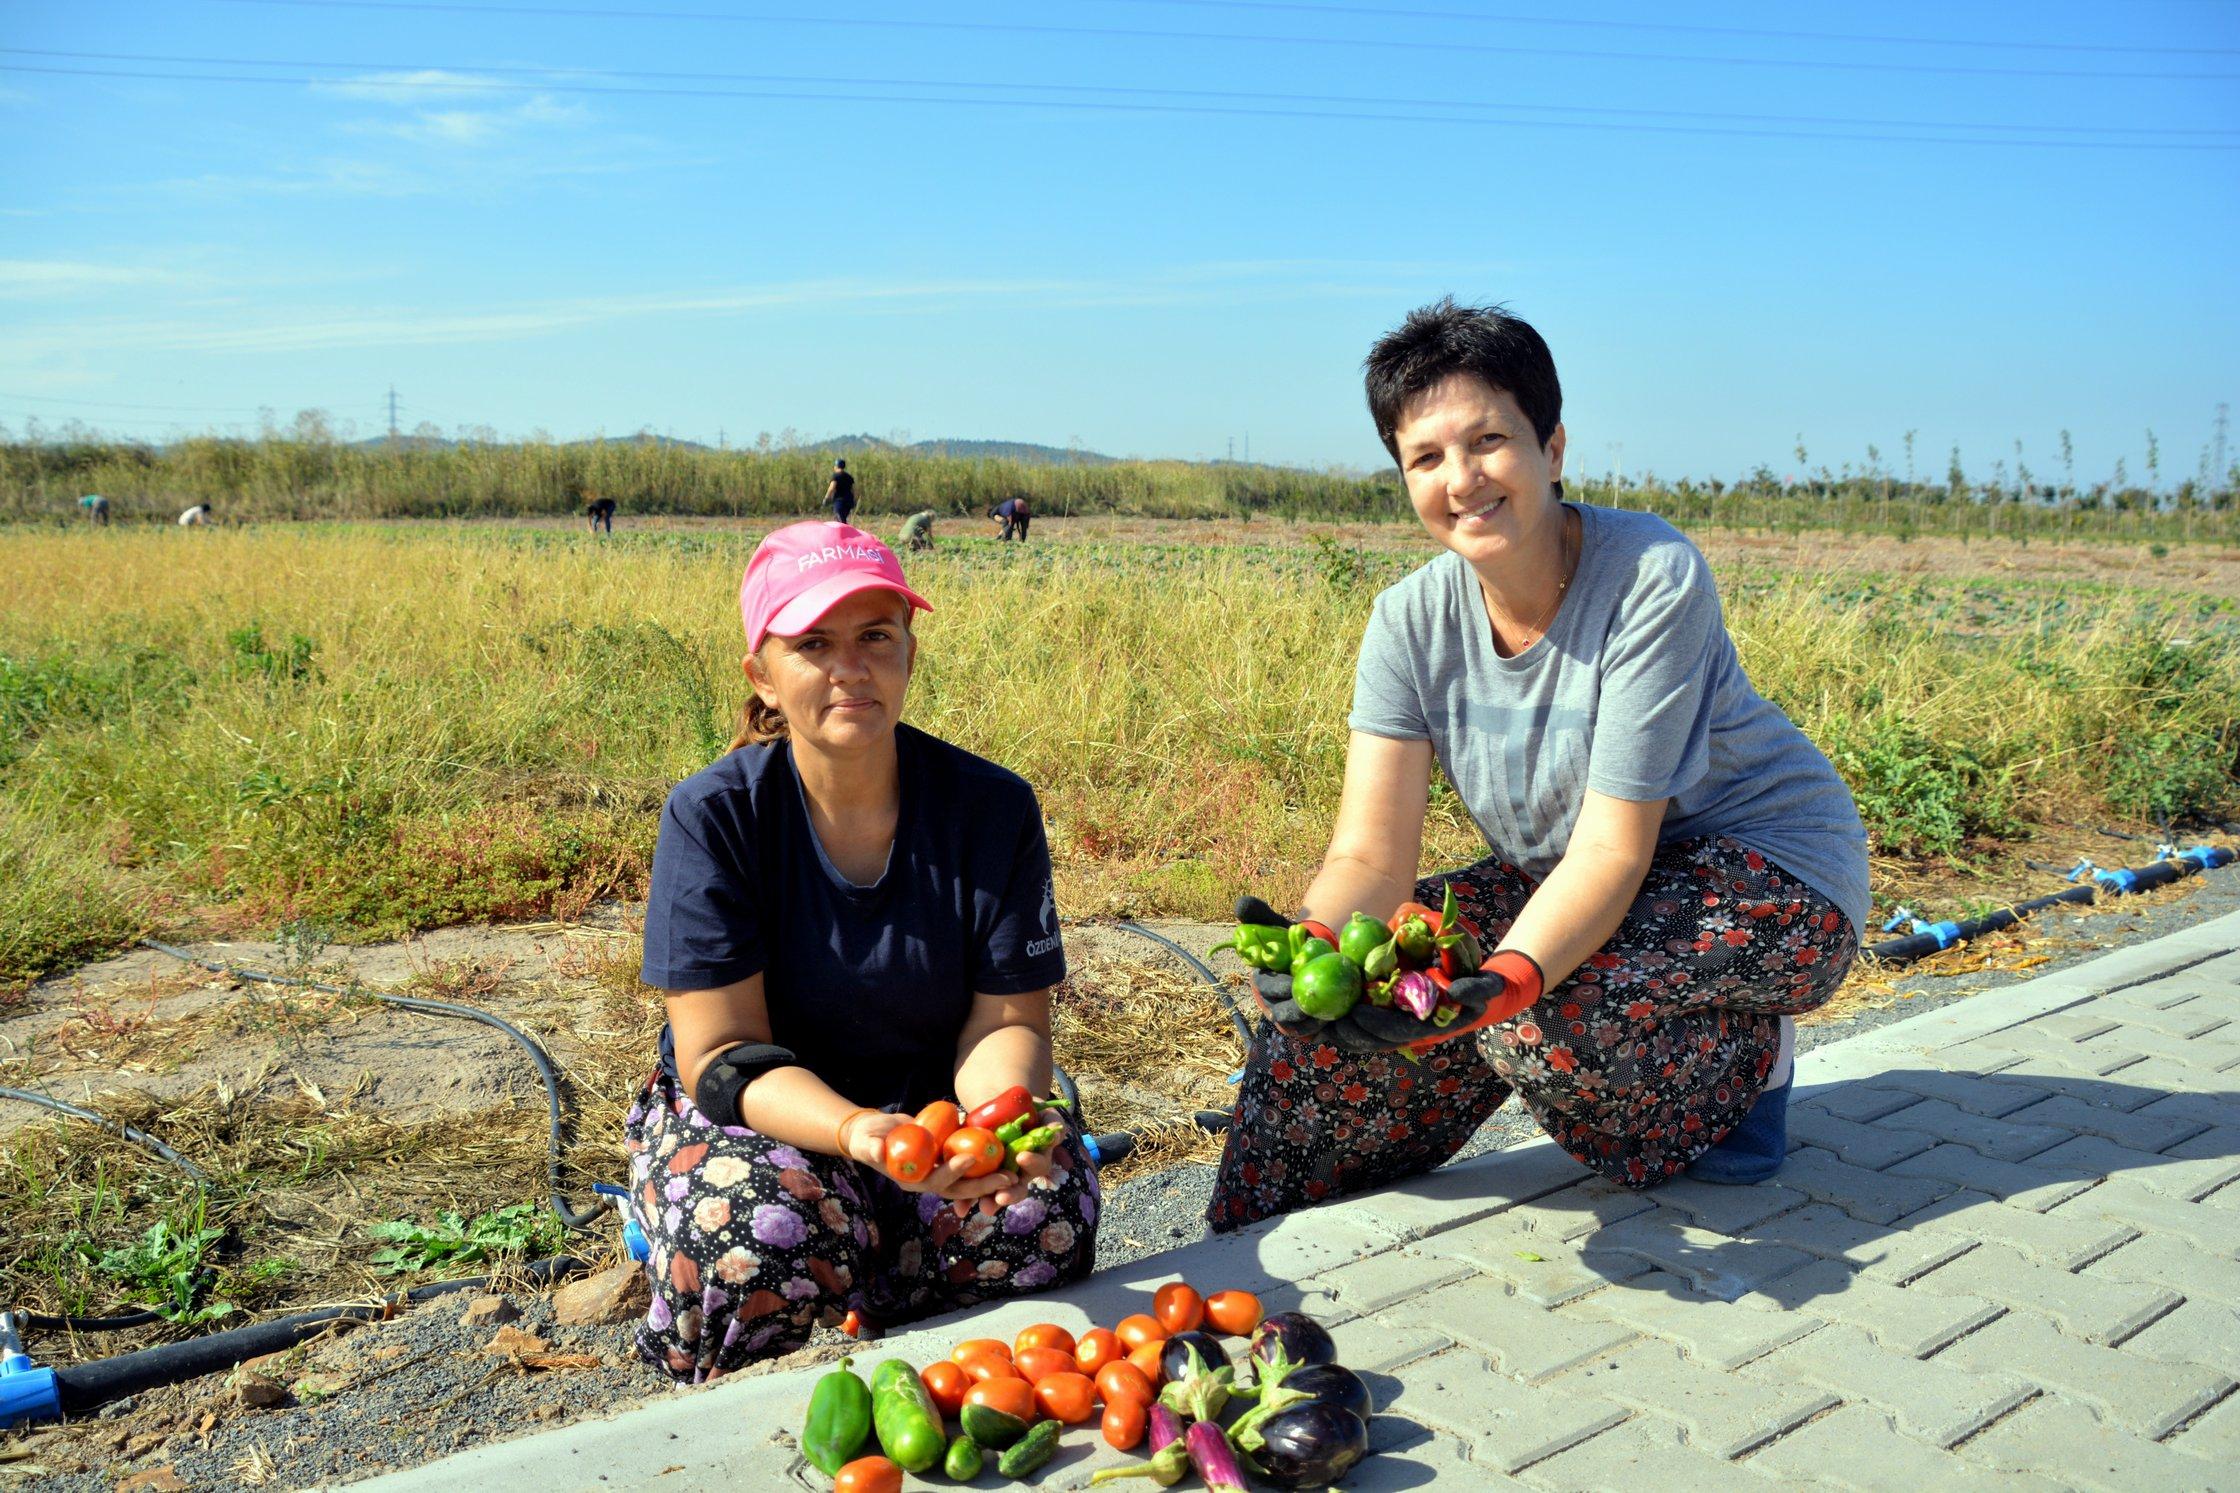 Aliağalı Kadınlardan Doğal Tarım Atağı